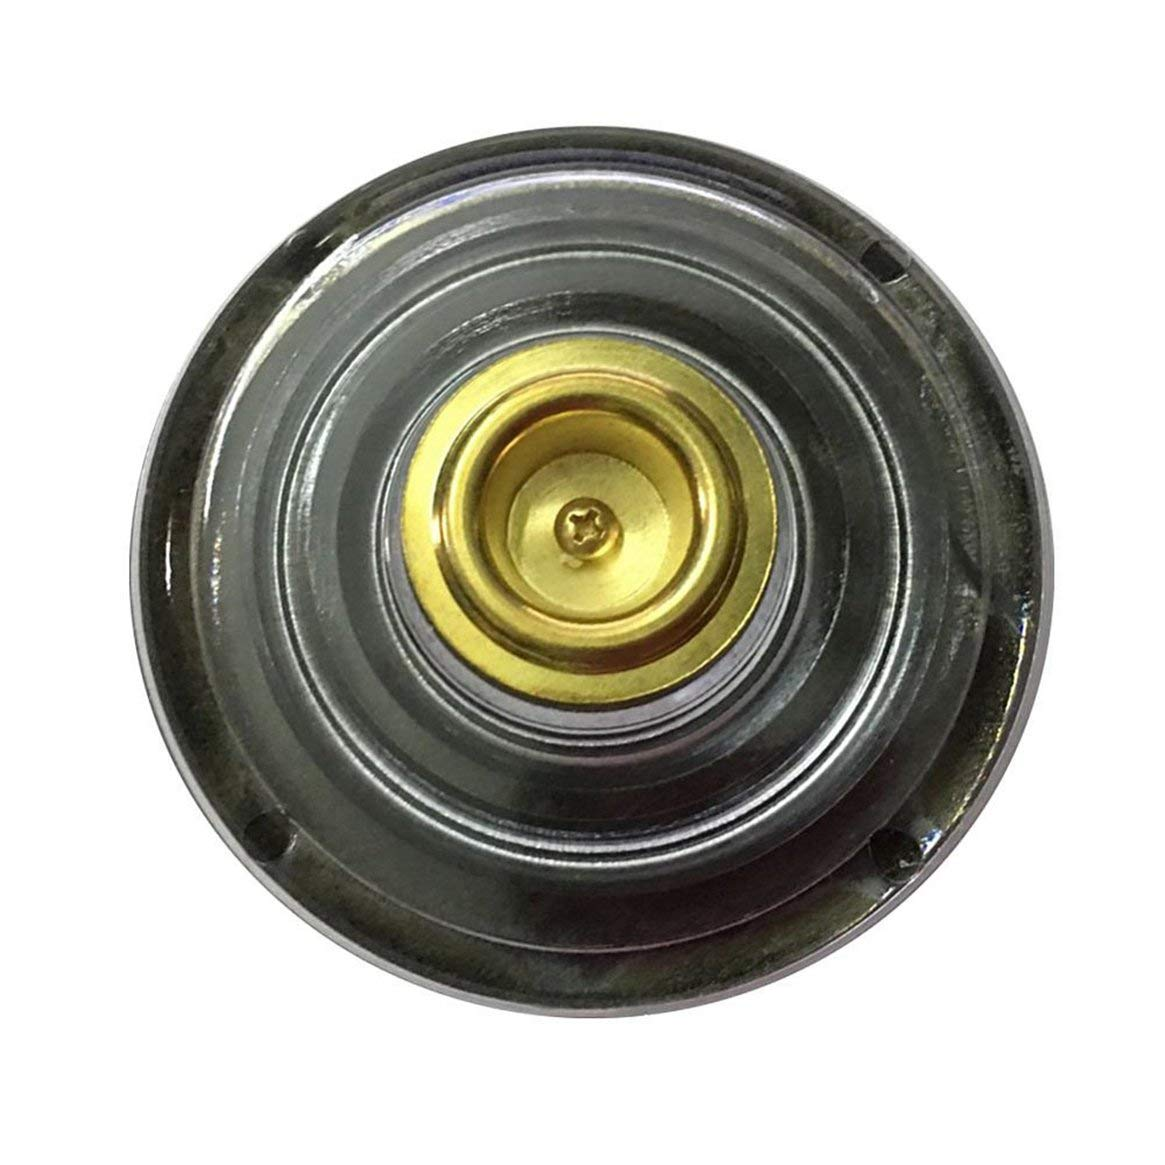 Lamica Cello End Pin Non-Slip Mat Stopper Holder Portable Cello Pad Floor Protector with Metal Eye Cello Instrument Accessories